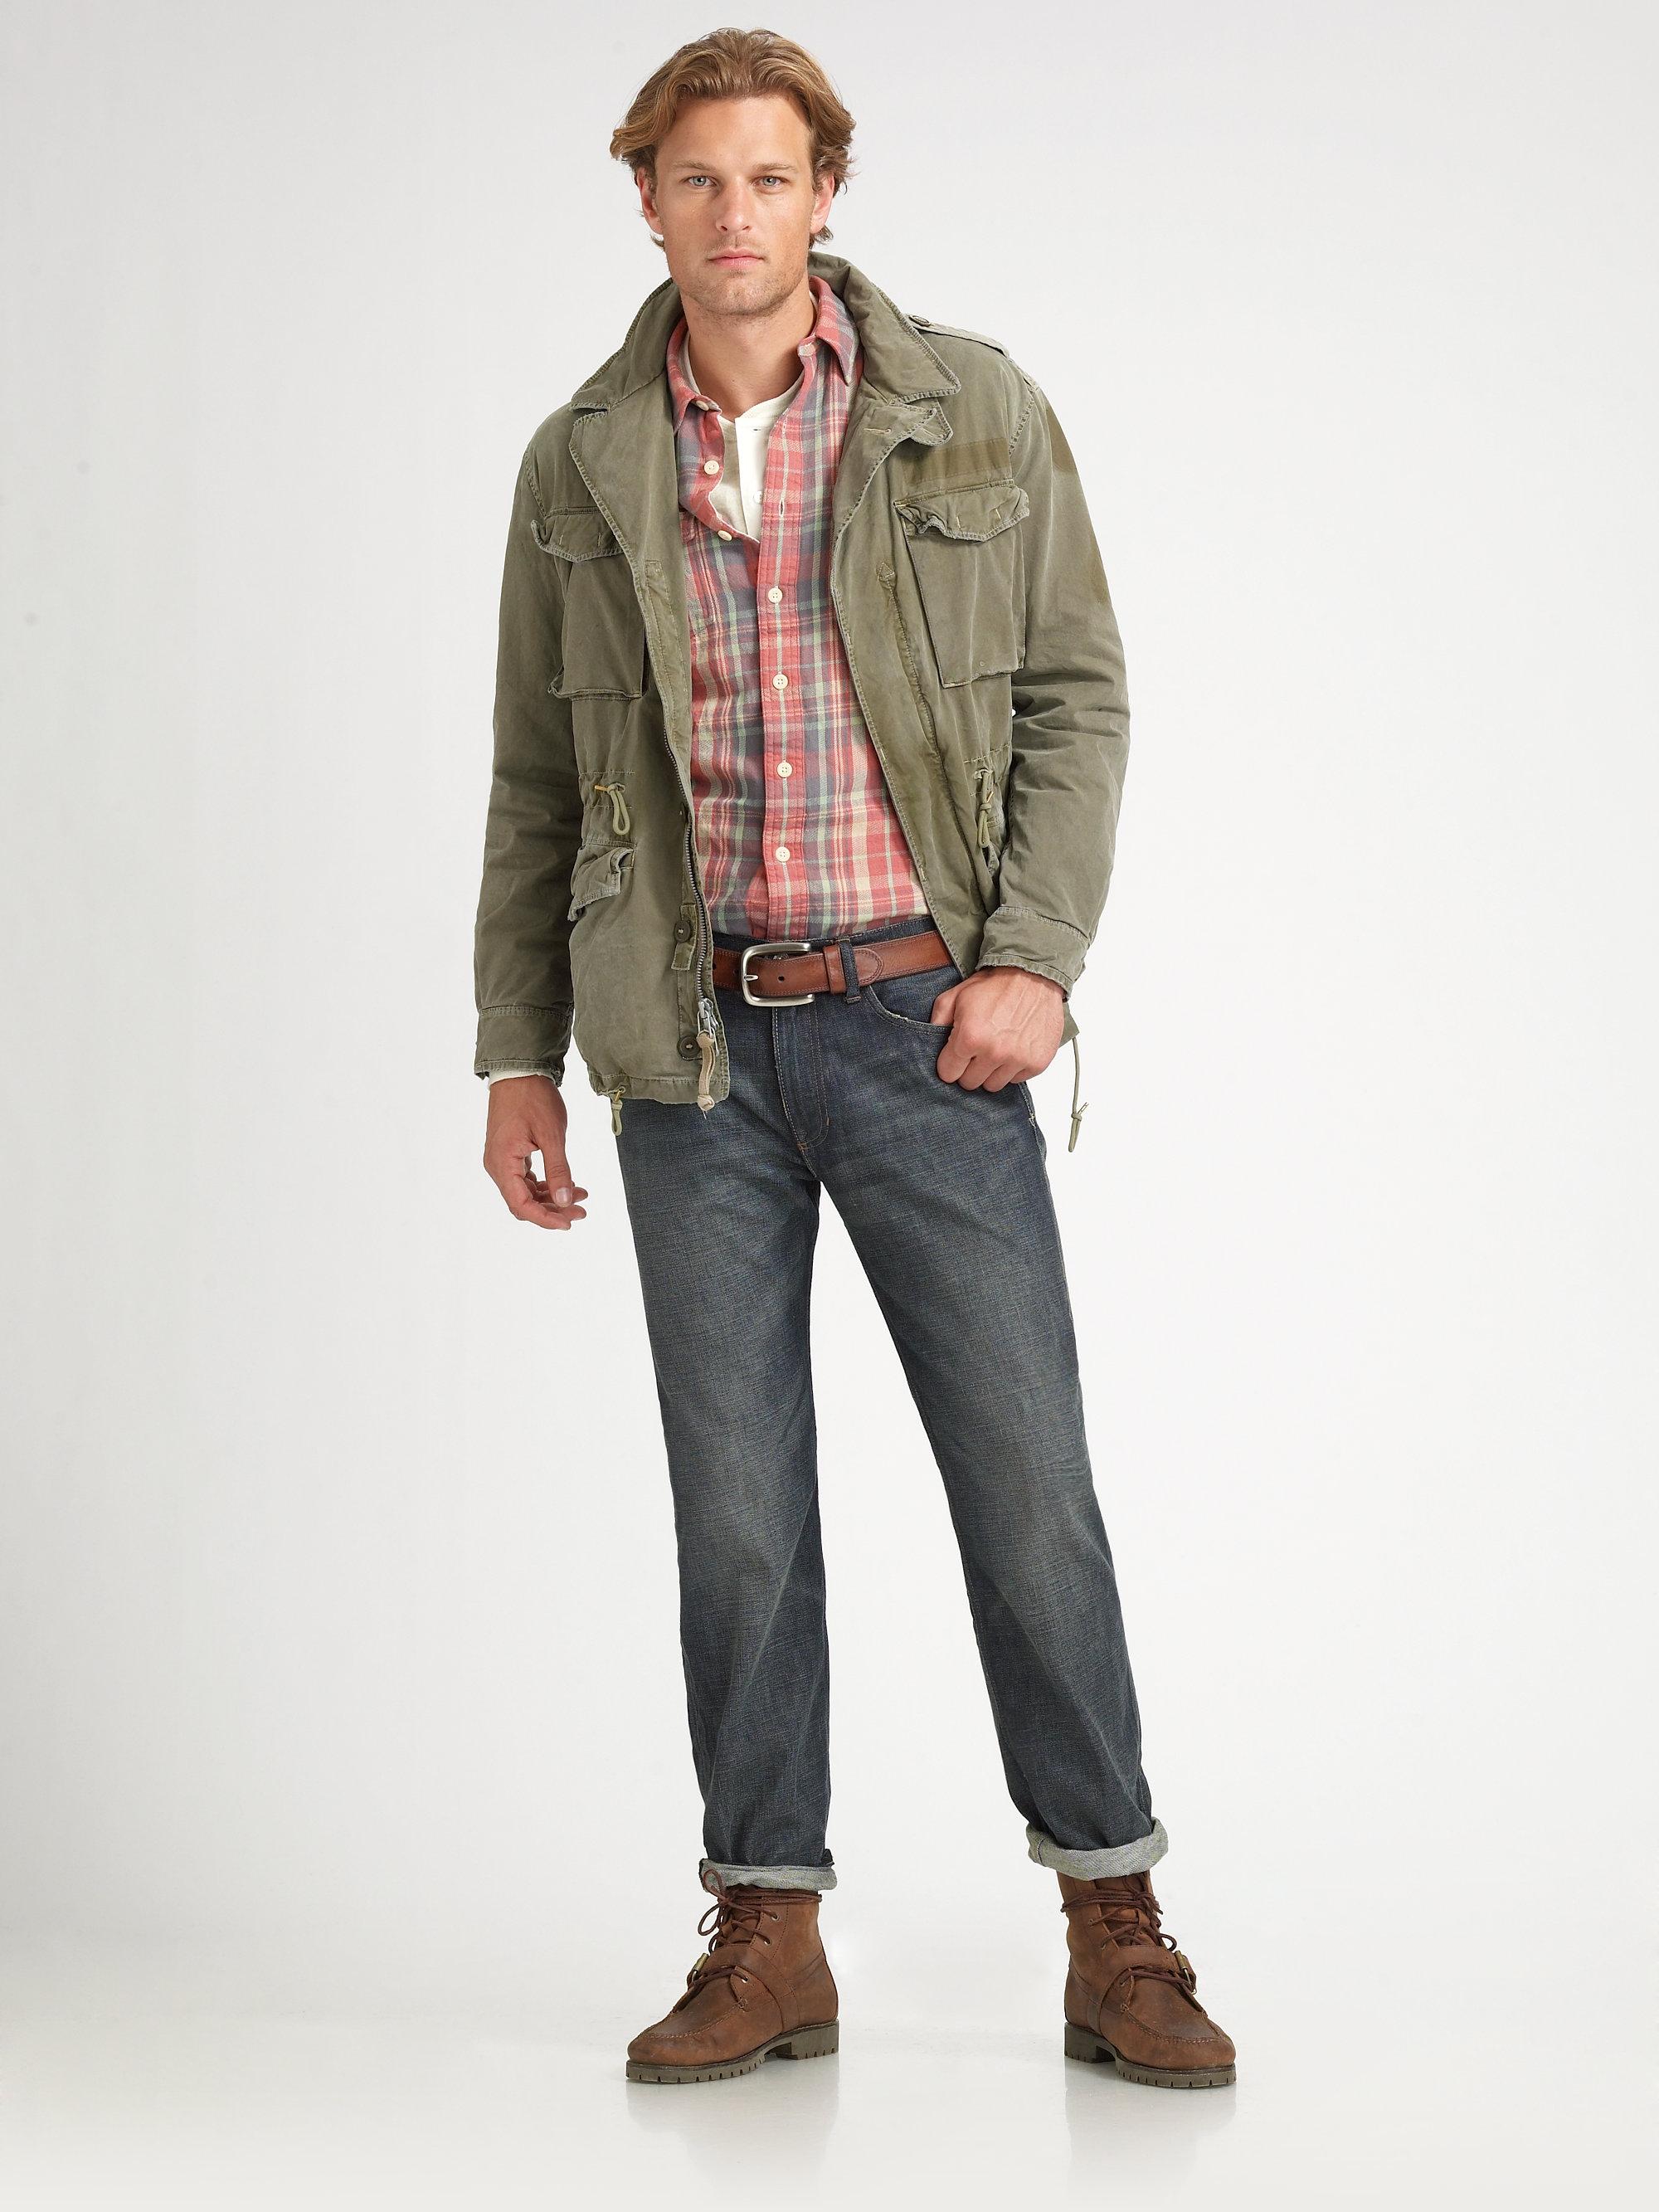 f5cdf7cbc polo ralph lauren military field cotton jacket - Dr. E. Horn GmbH ...